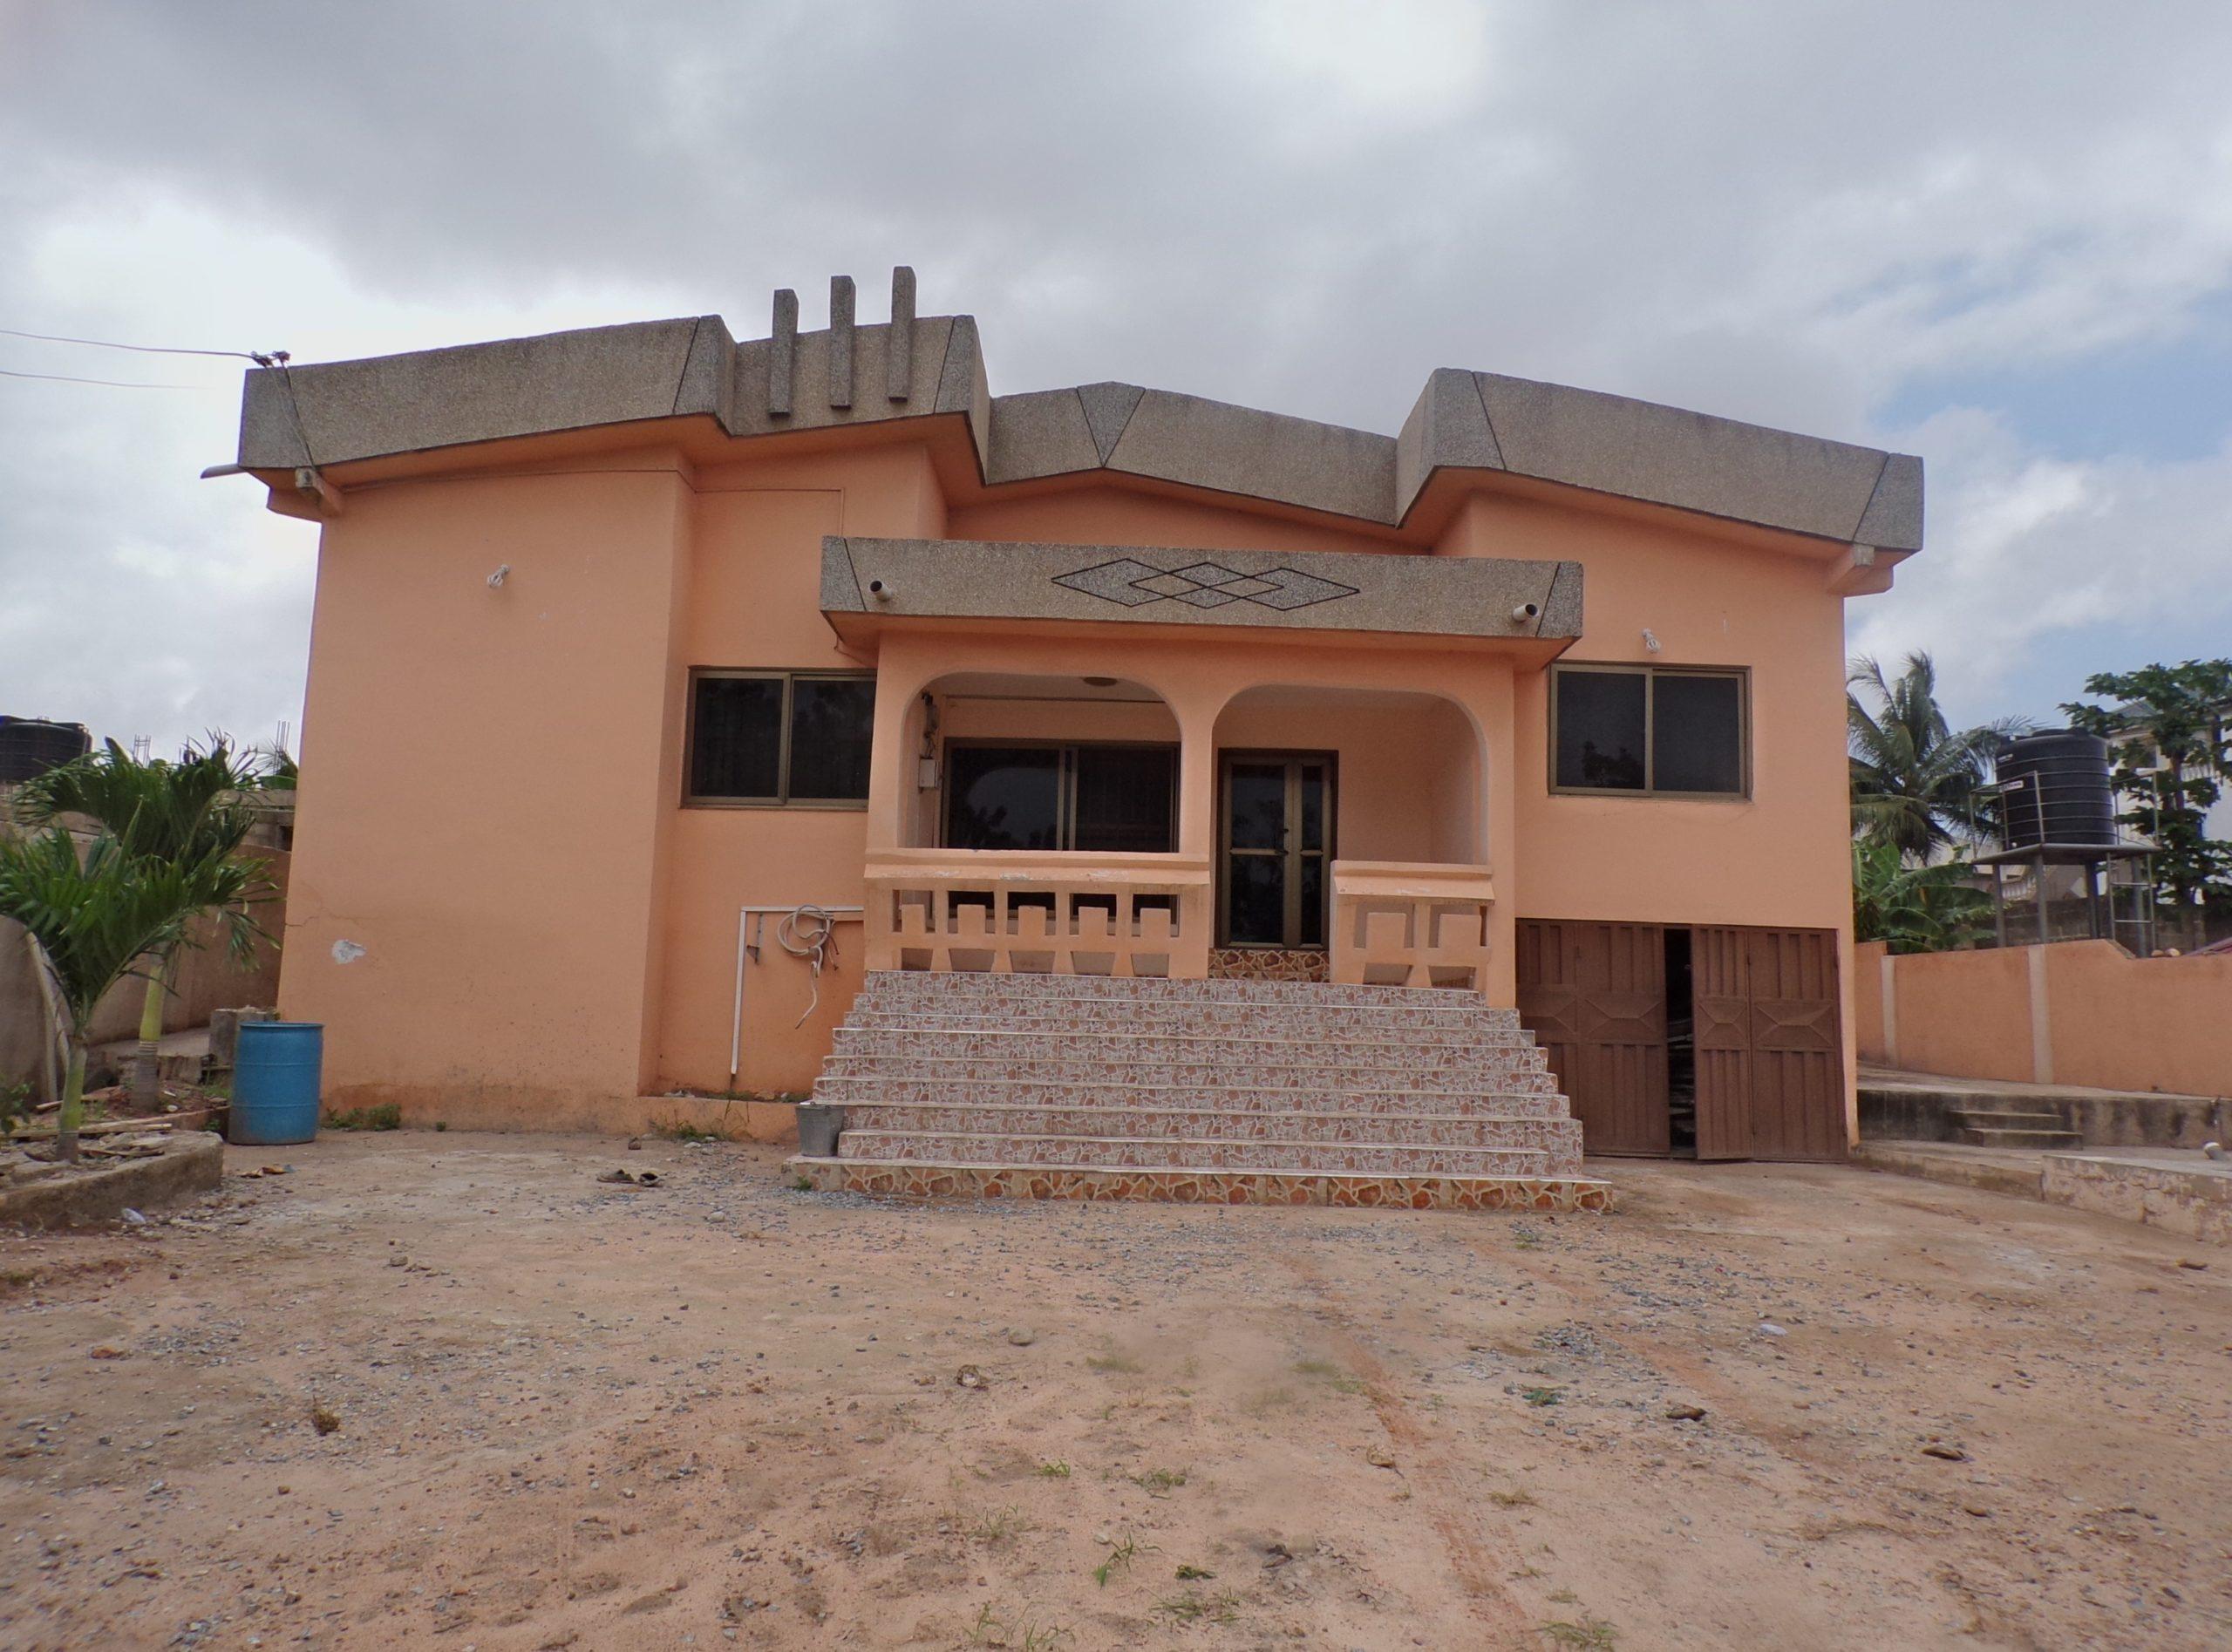 4 BEDROOM HOUSE FOR RENT AT OFANKOR